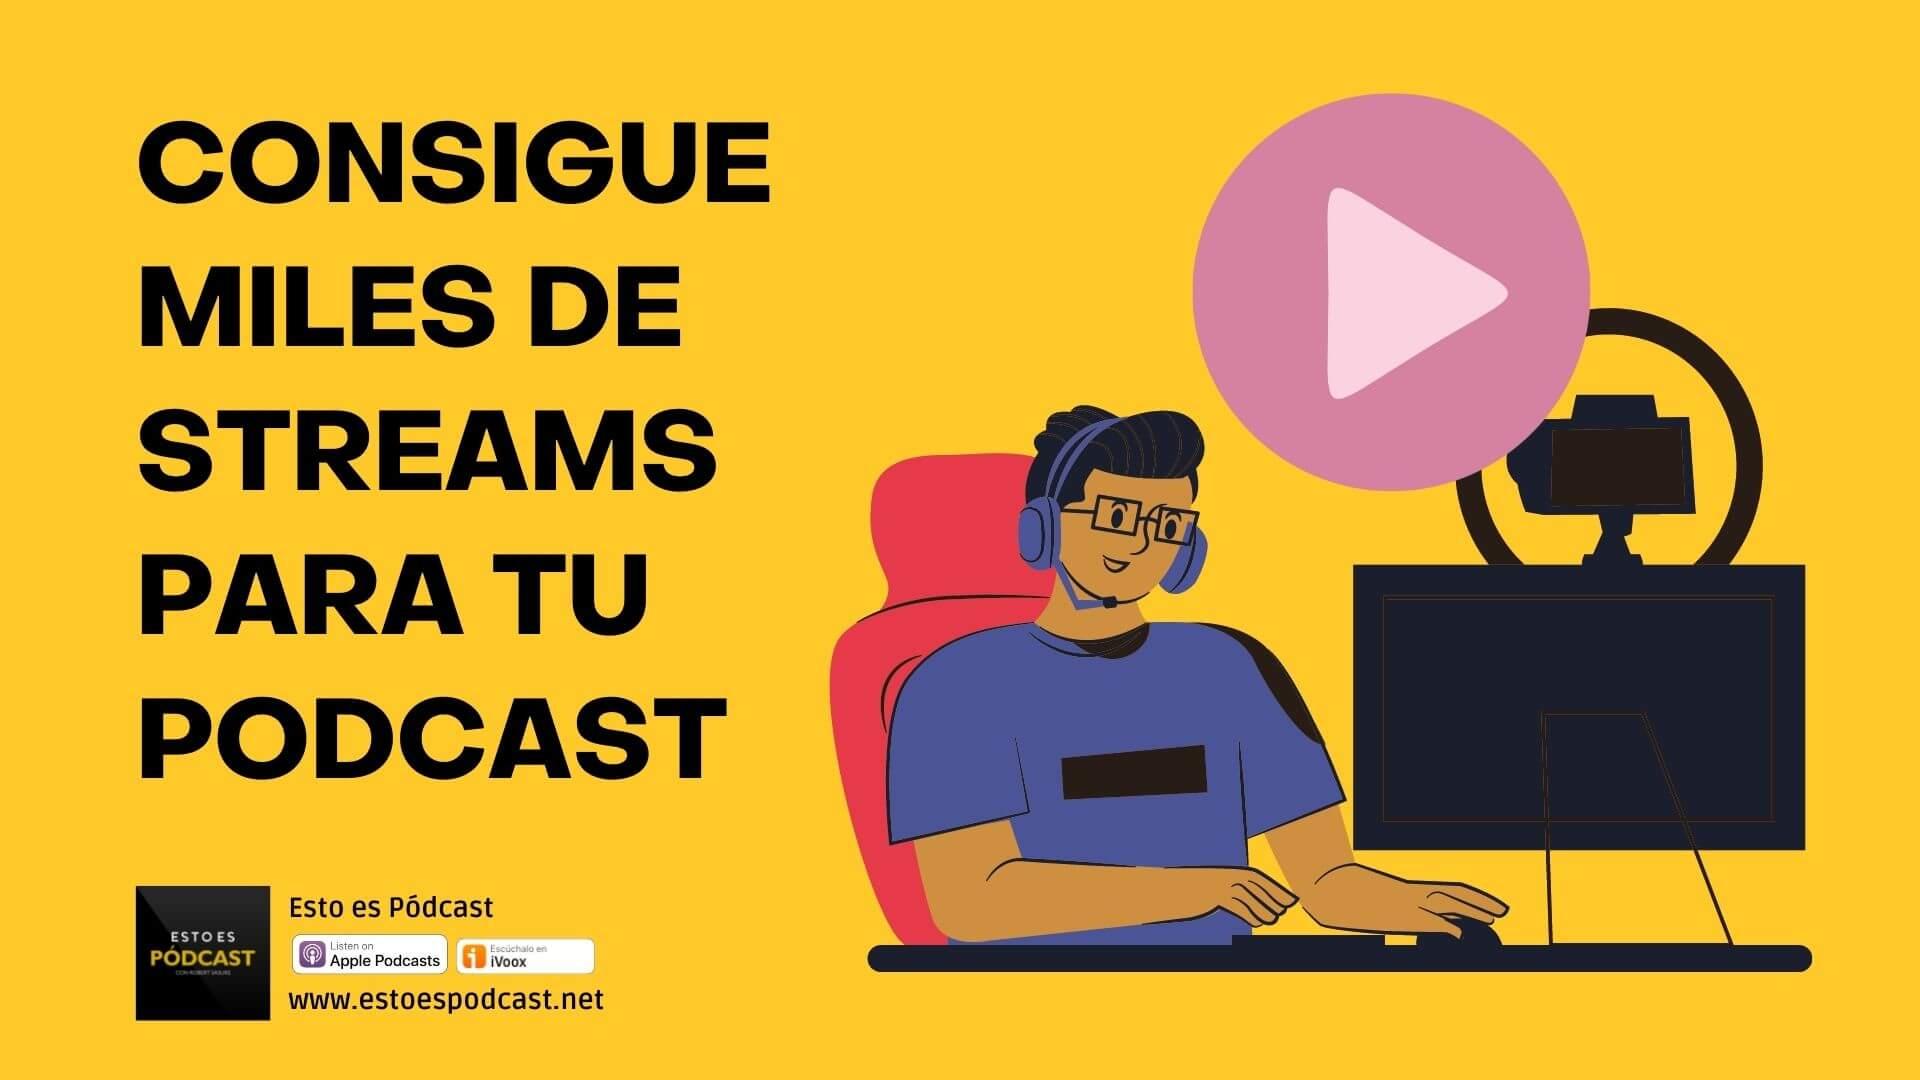 152. Experimento: Conseguir Miles de Streams de 1 Episodio de Podcast